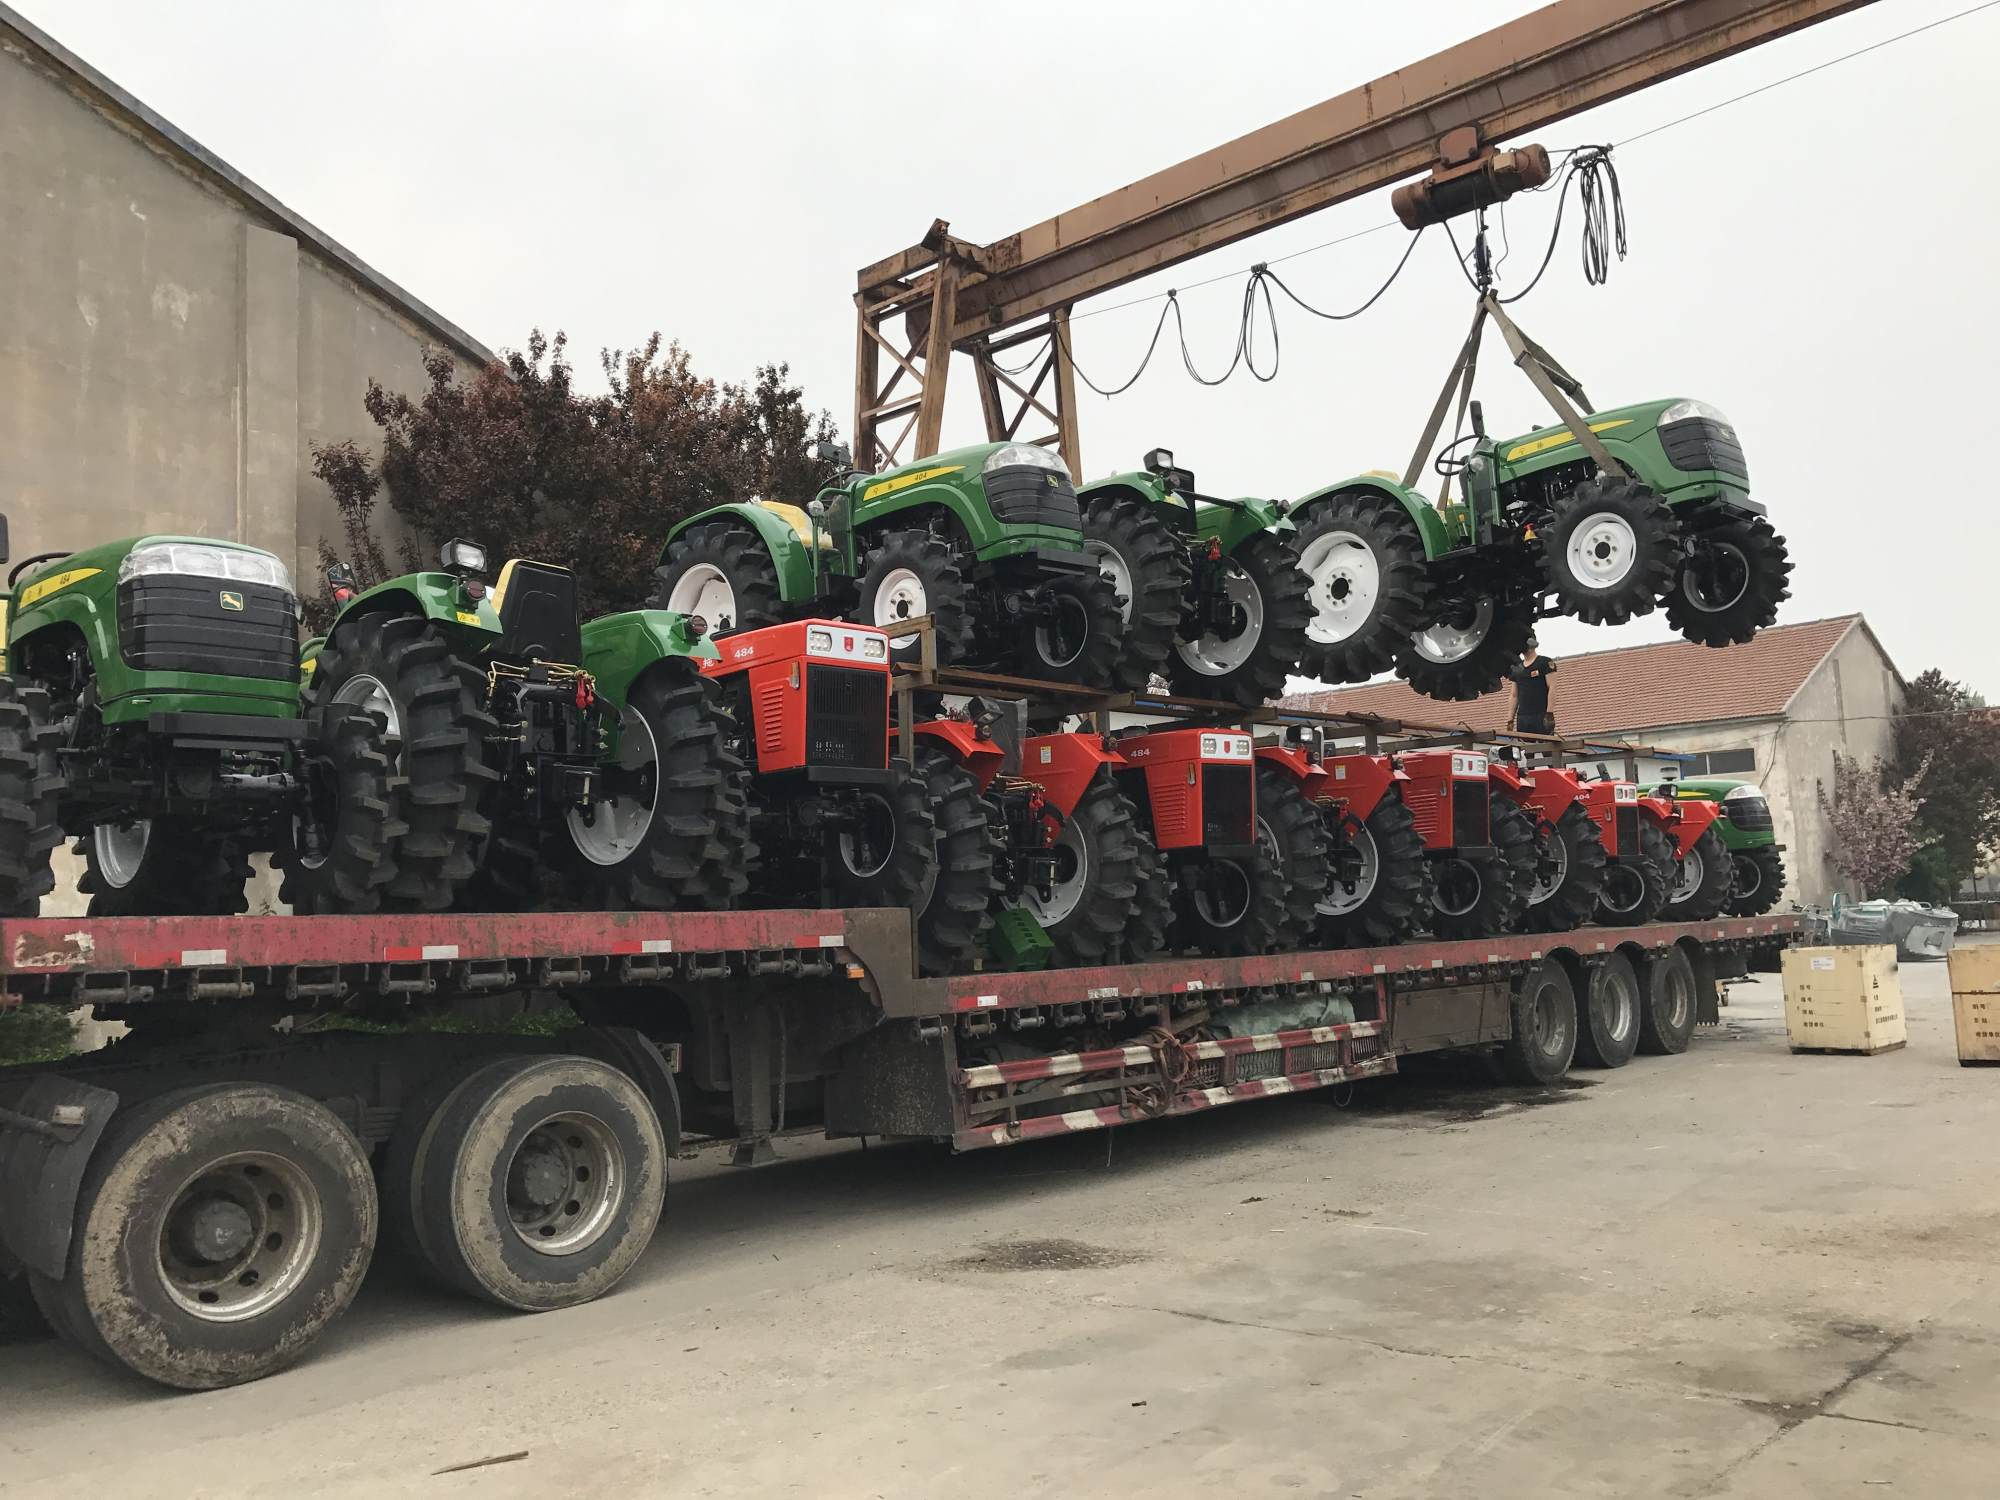 Medium horsepower tractor delivery